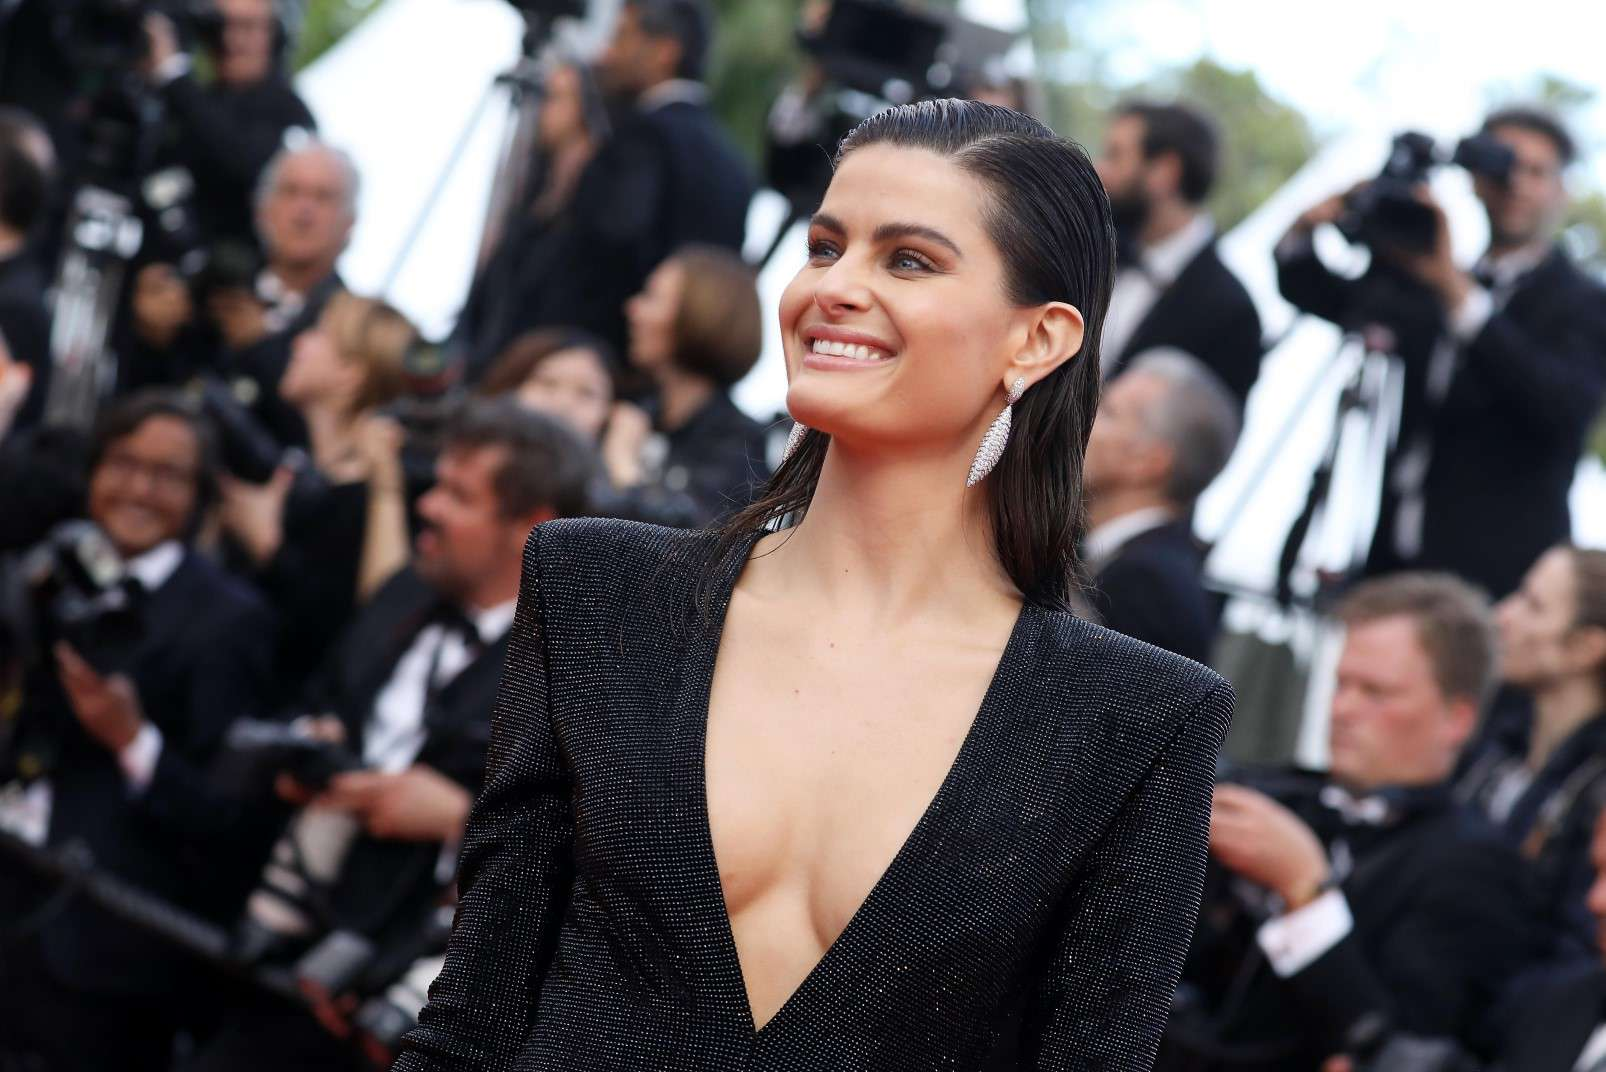 Cannes 2018, Isabeli Fontana wearing de Grisogono jewellery, photo courtesy of de Grisogono